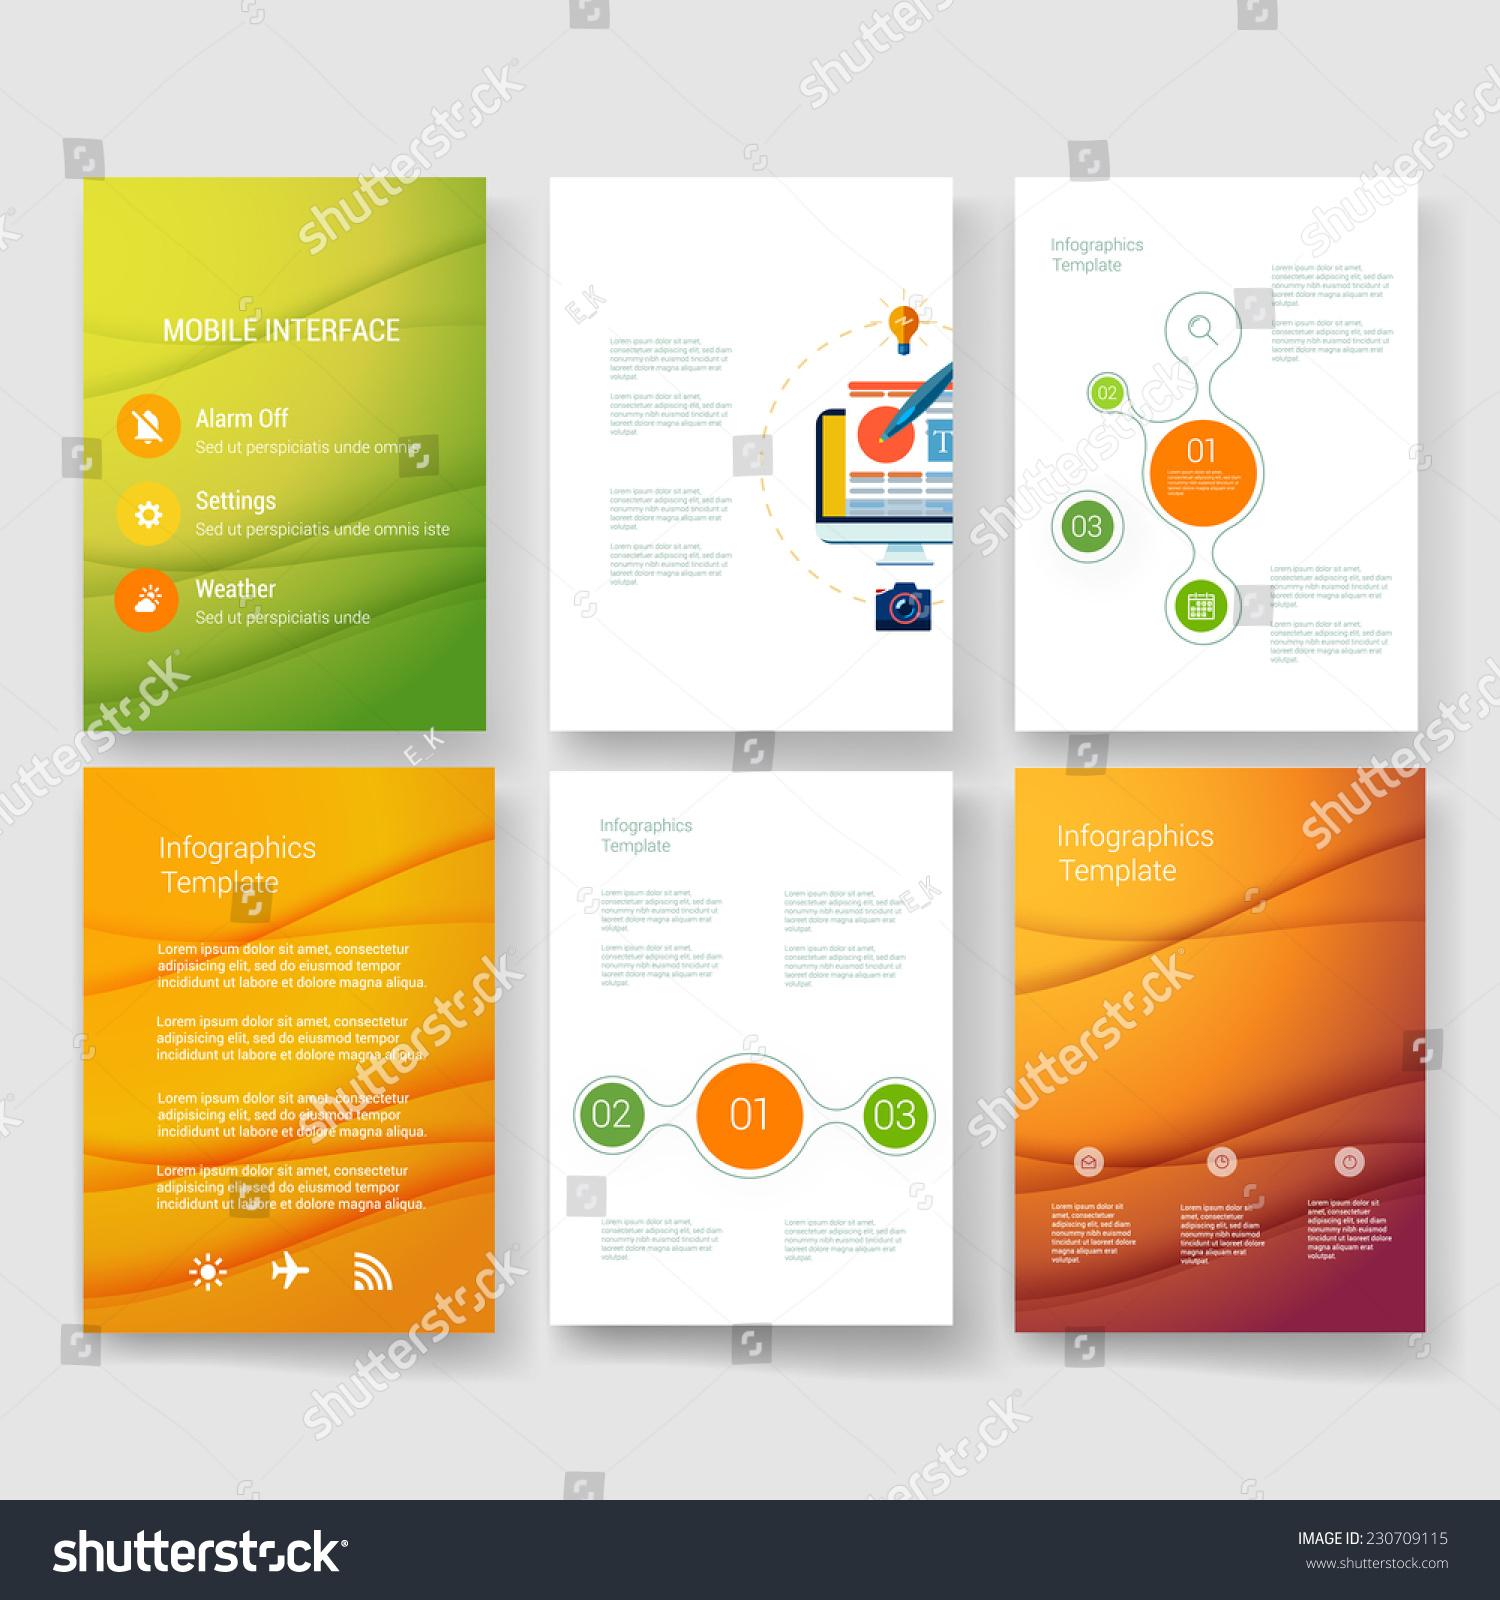 applications templates